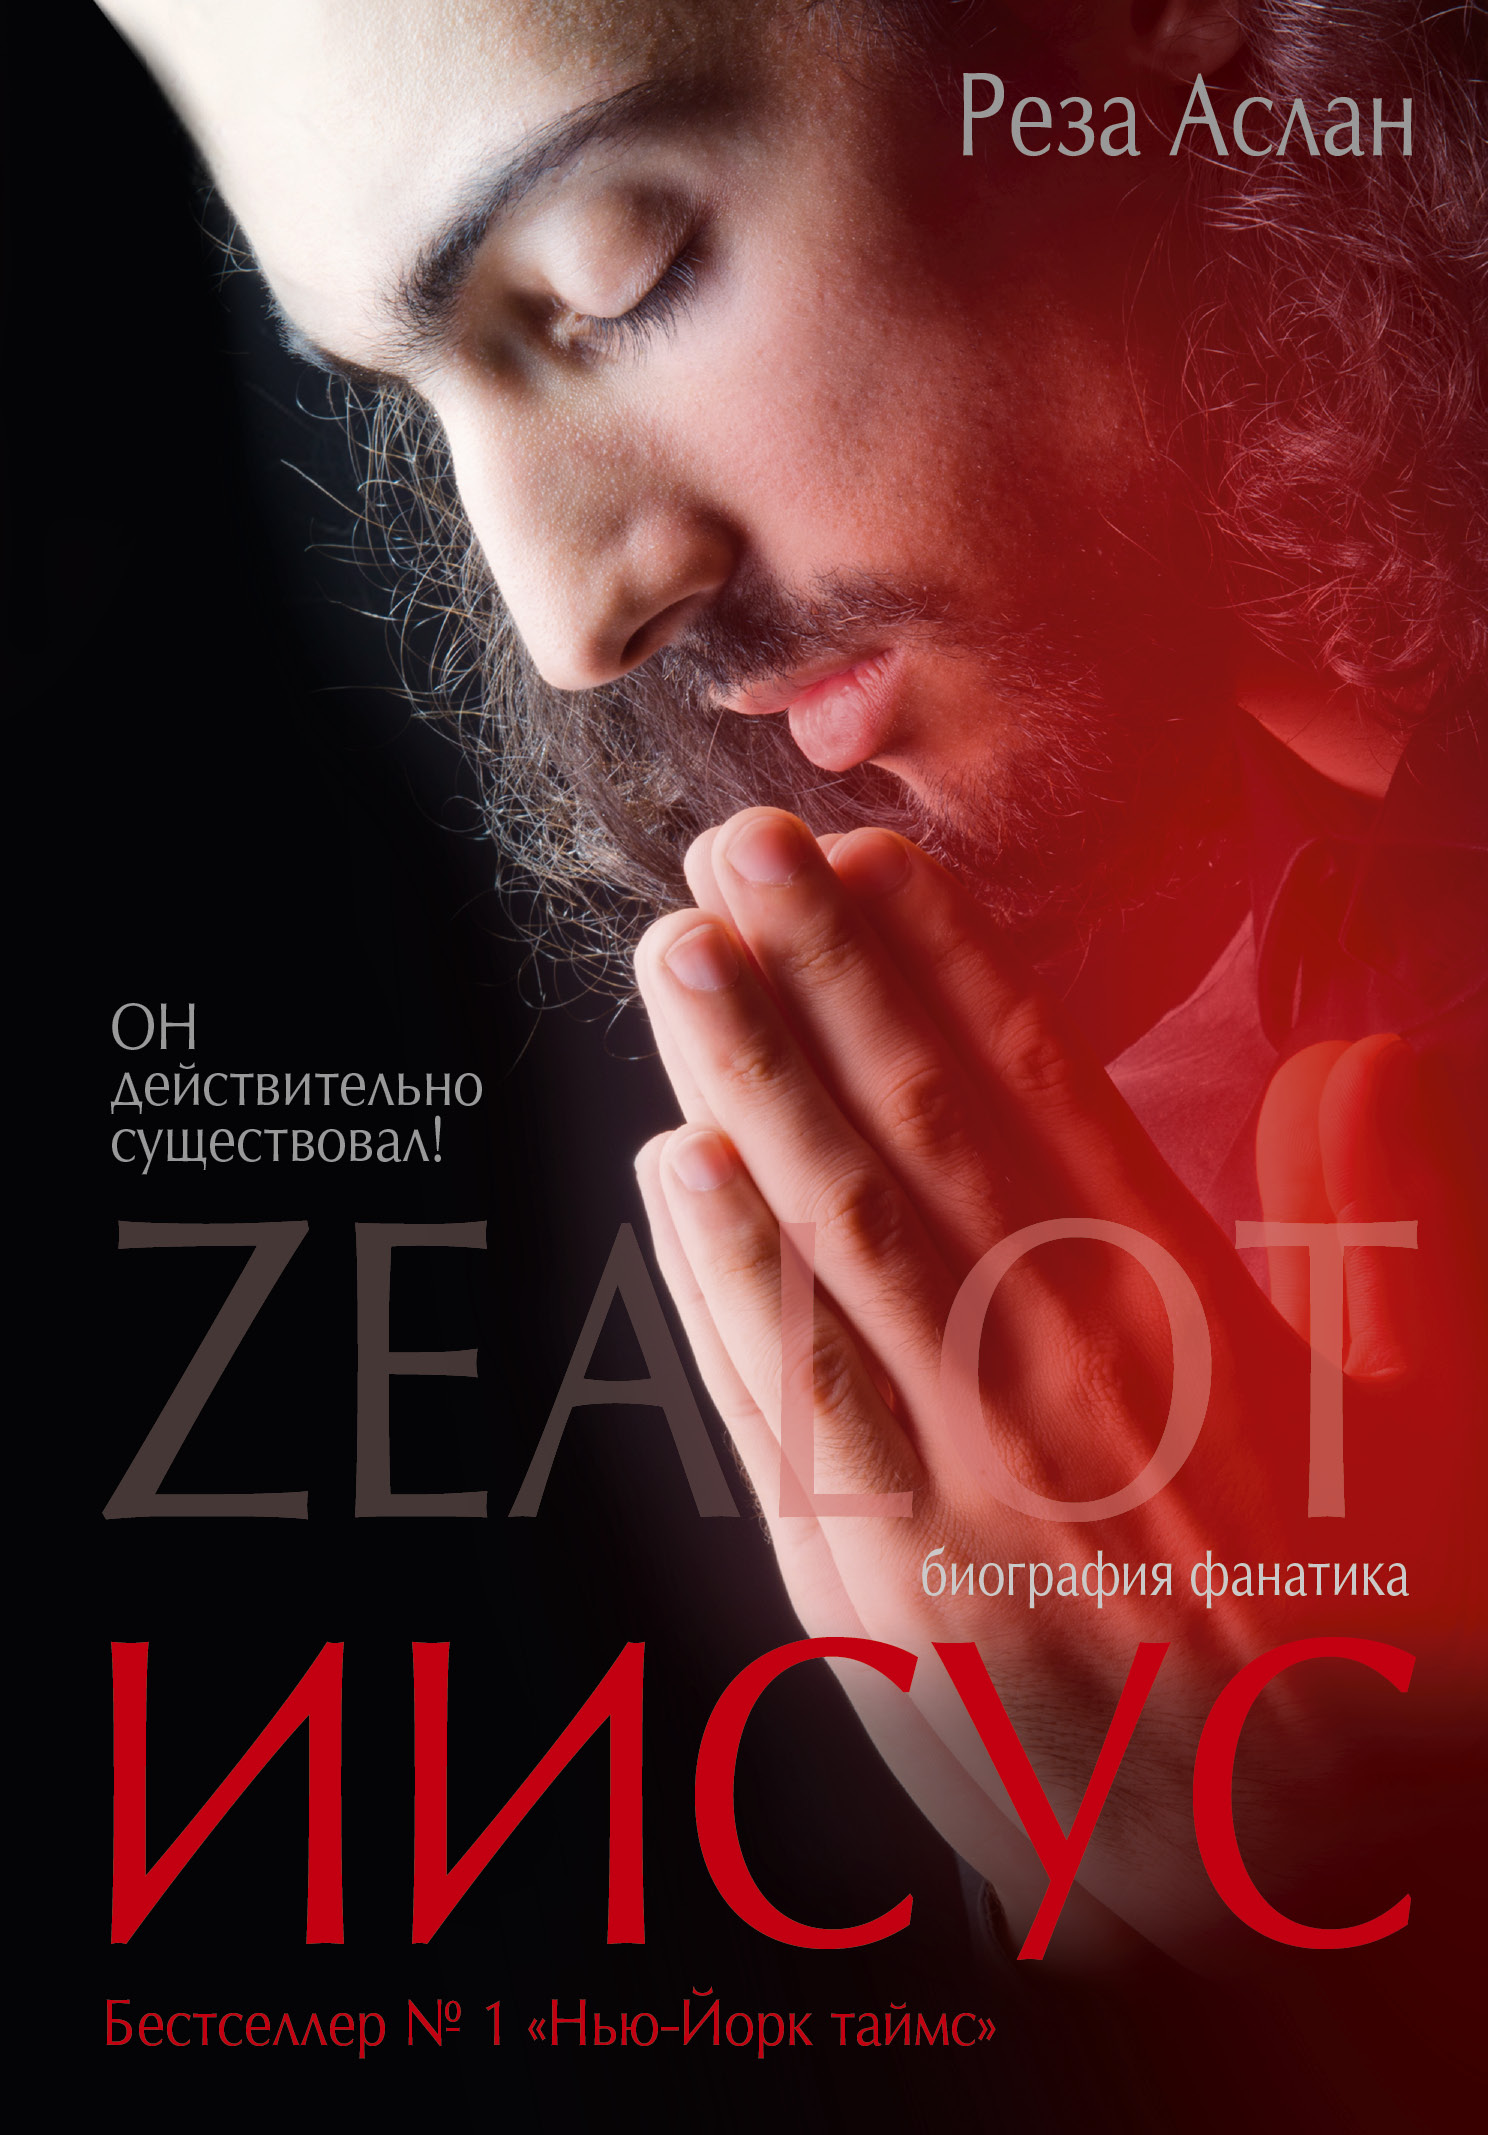 Zealot. Иисус: биография фанатика